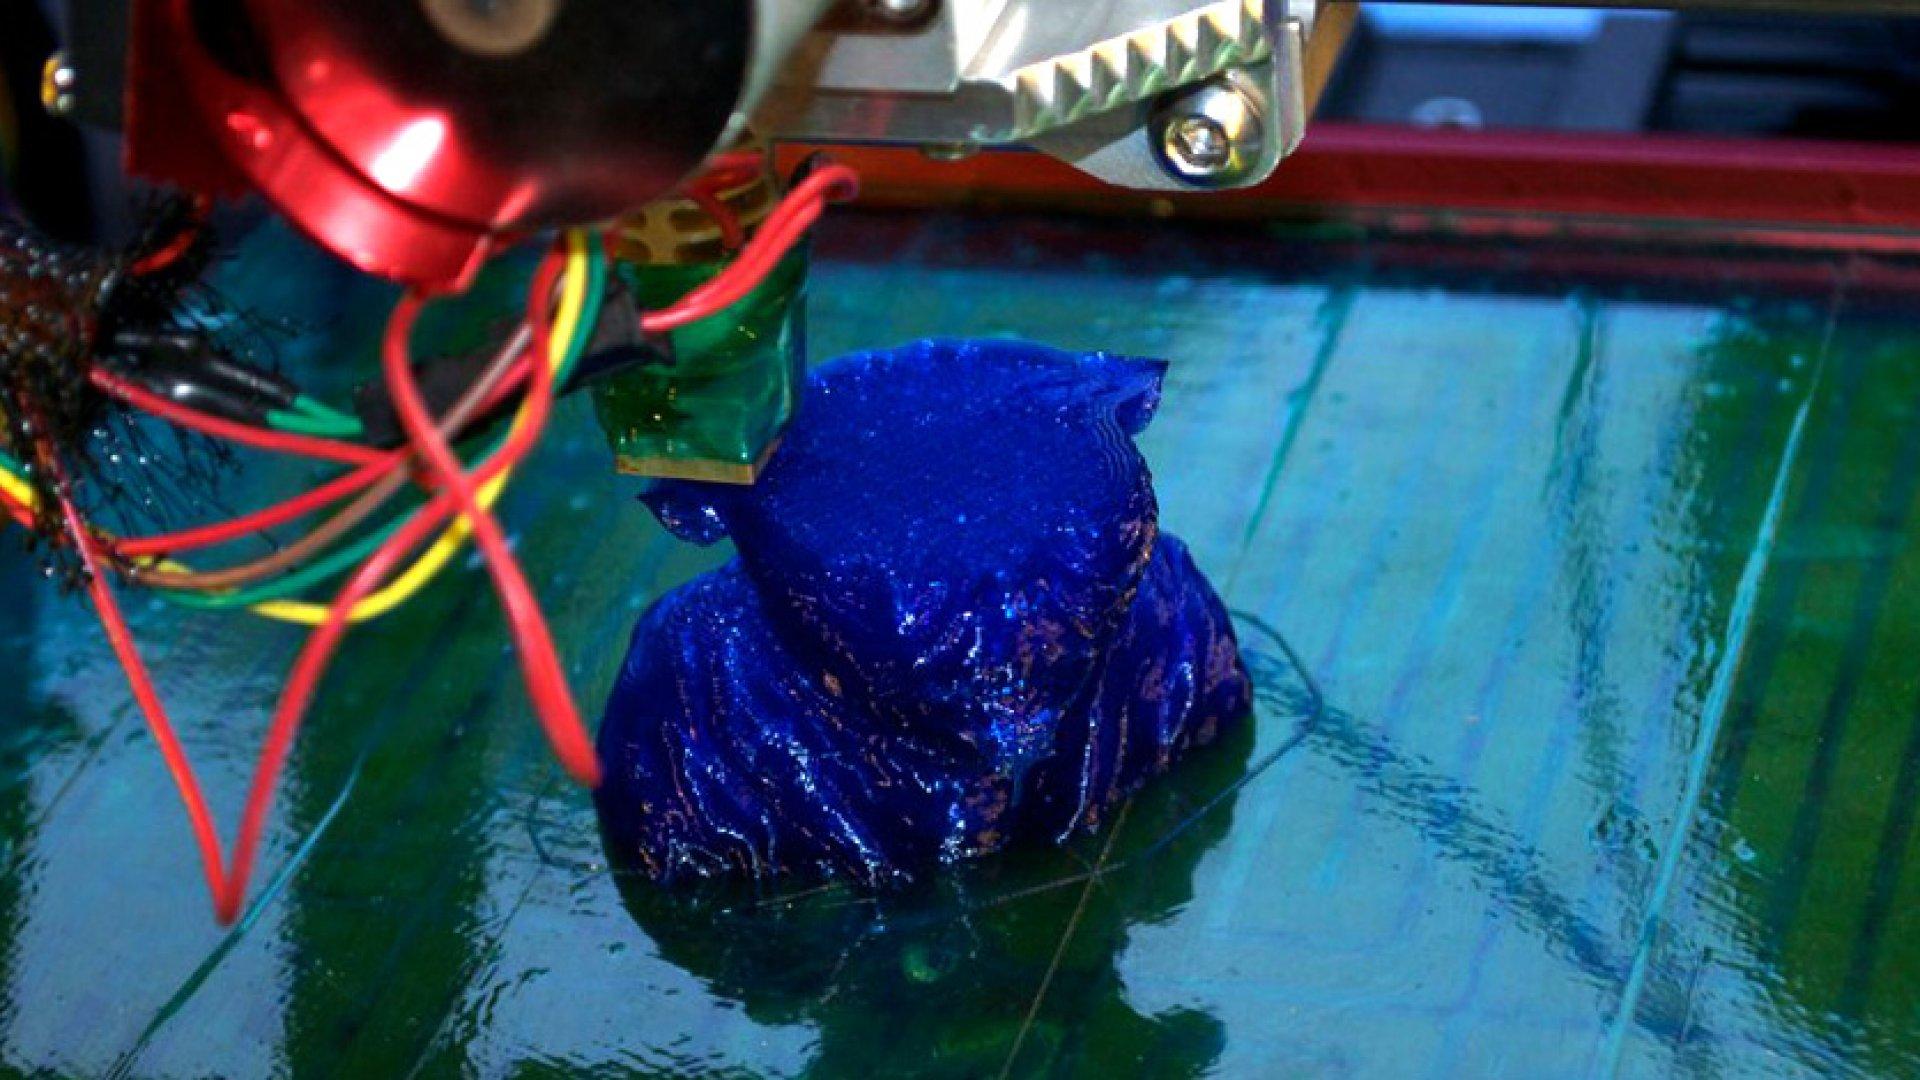 A 3-D printer at work.